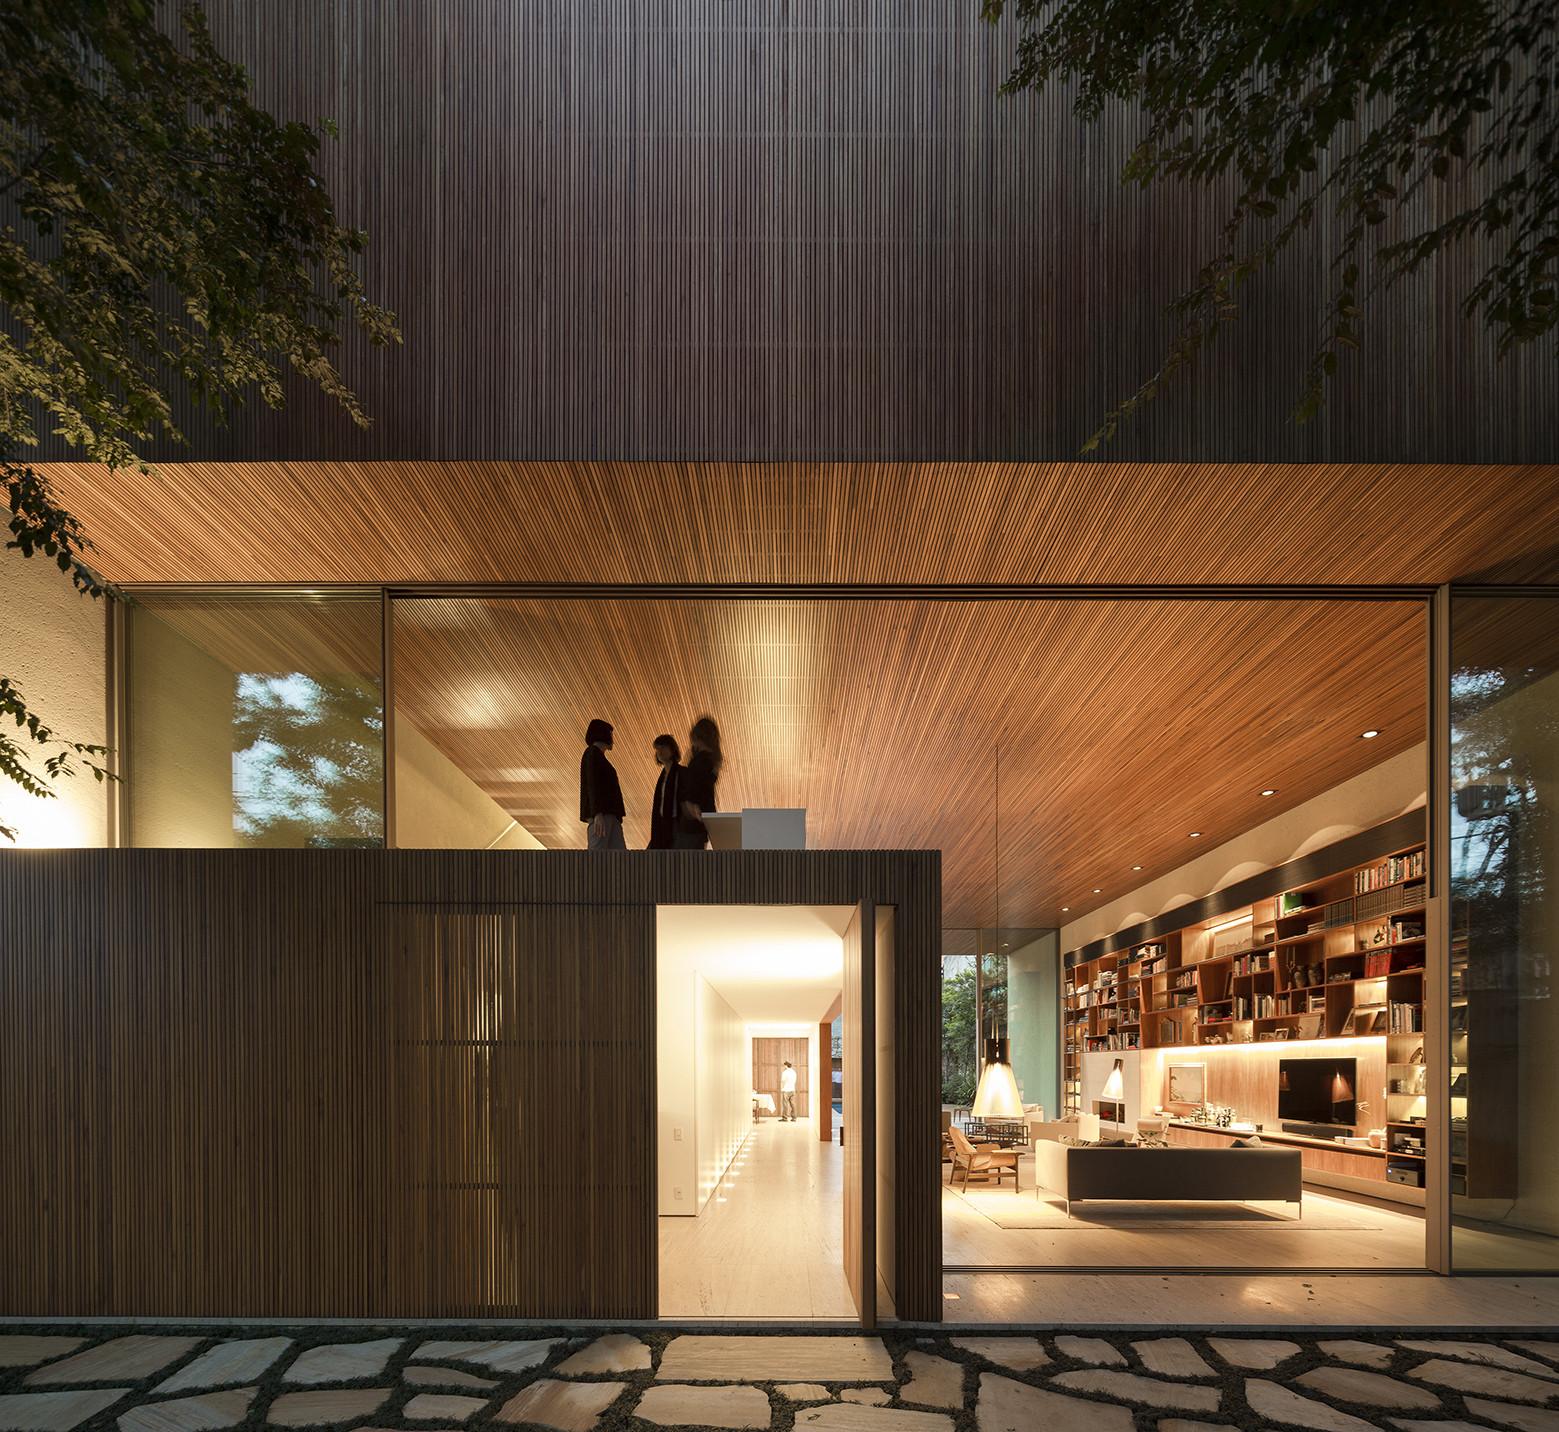 Gallery of Tetris House / Studio MK27 - Marcio Kogan